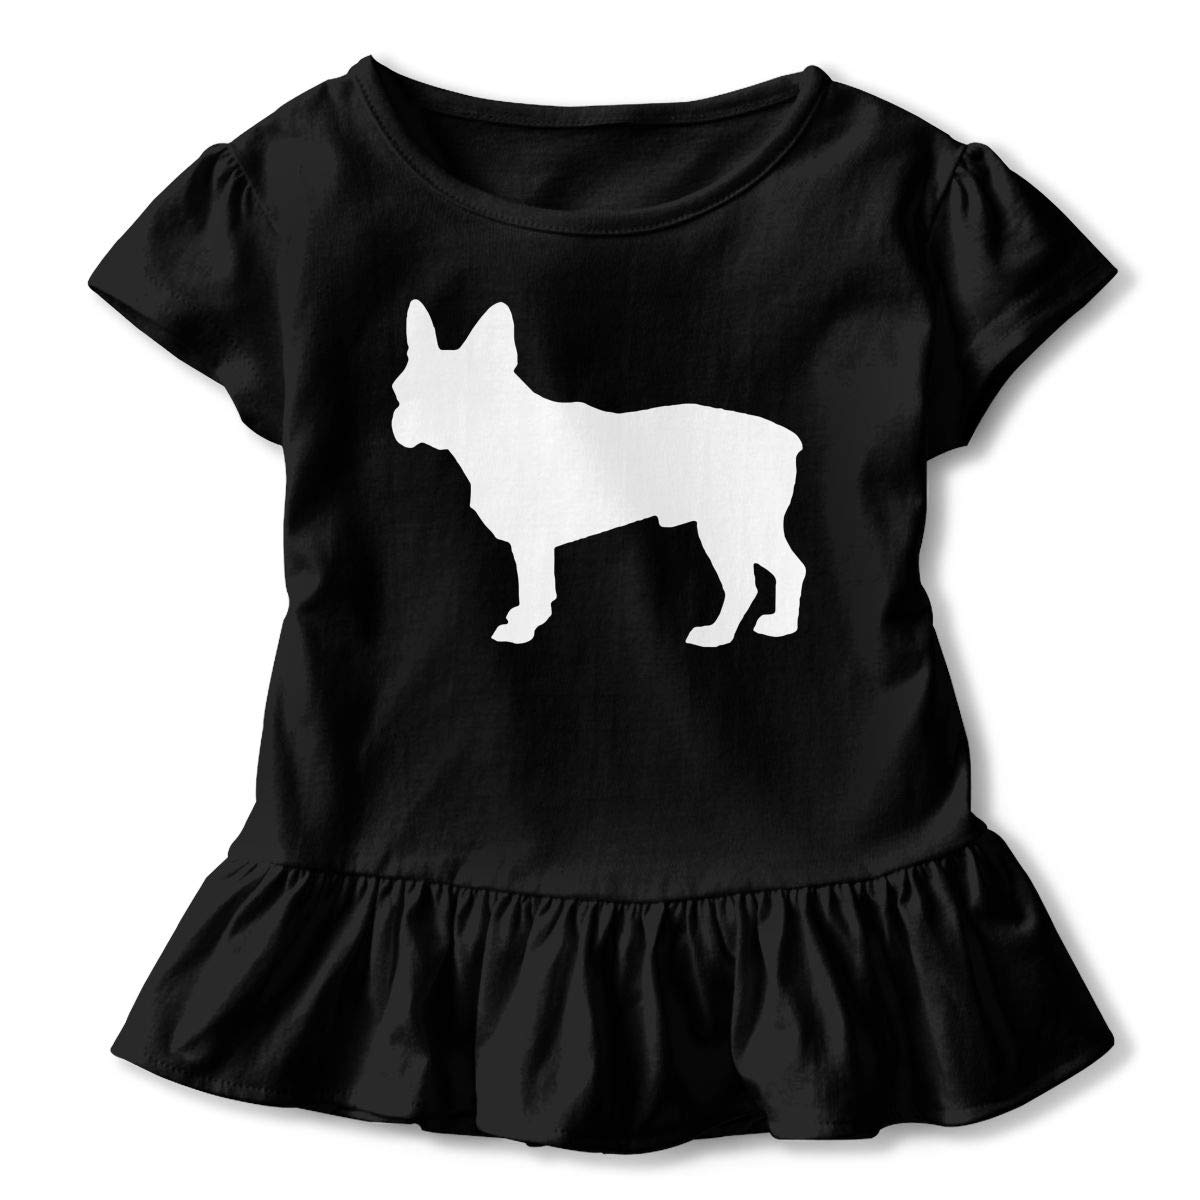 SHIRT1-KIDS French Bulldog Toddler//Infant Girls Short Sleeve Ruffles Shirt T-Shirt for 2-6 Toddlers